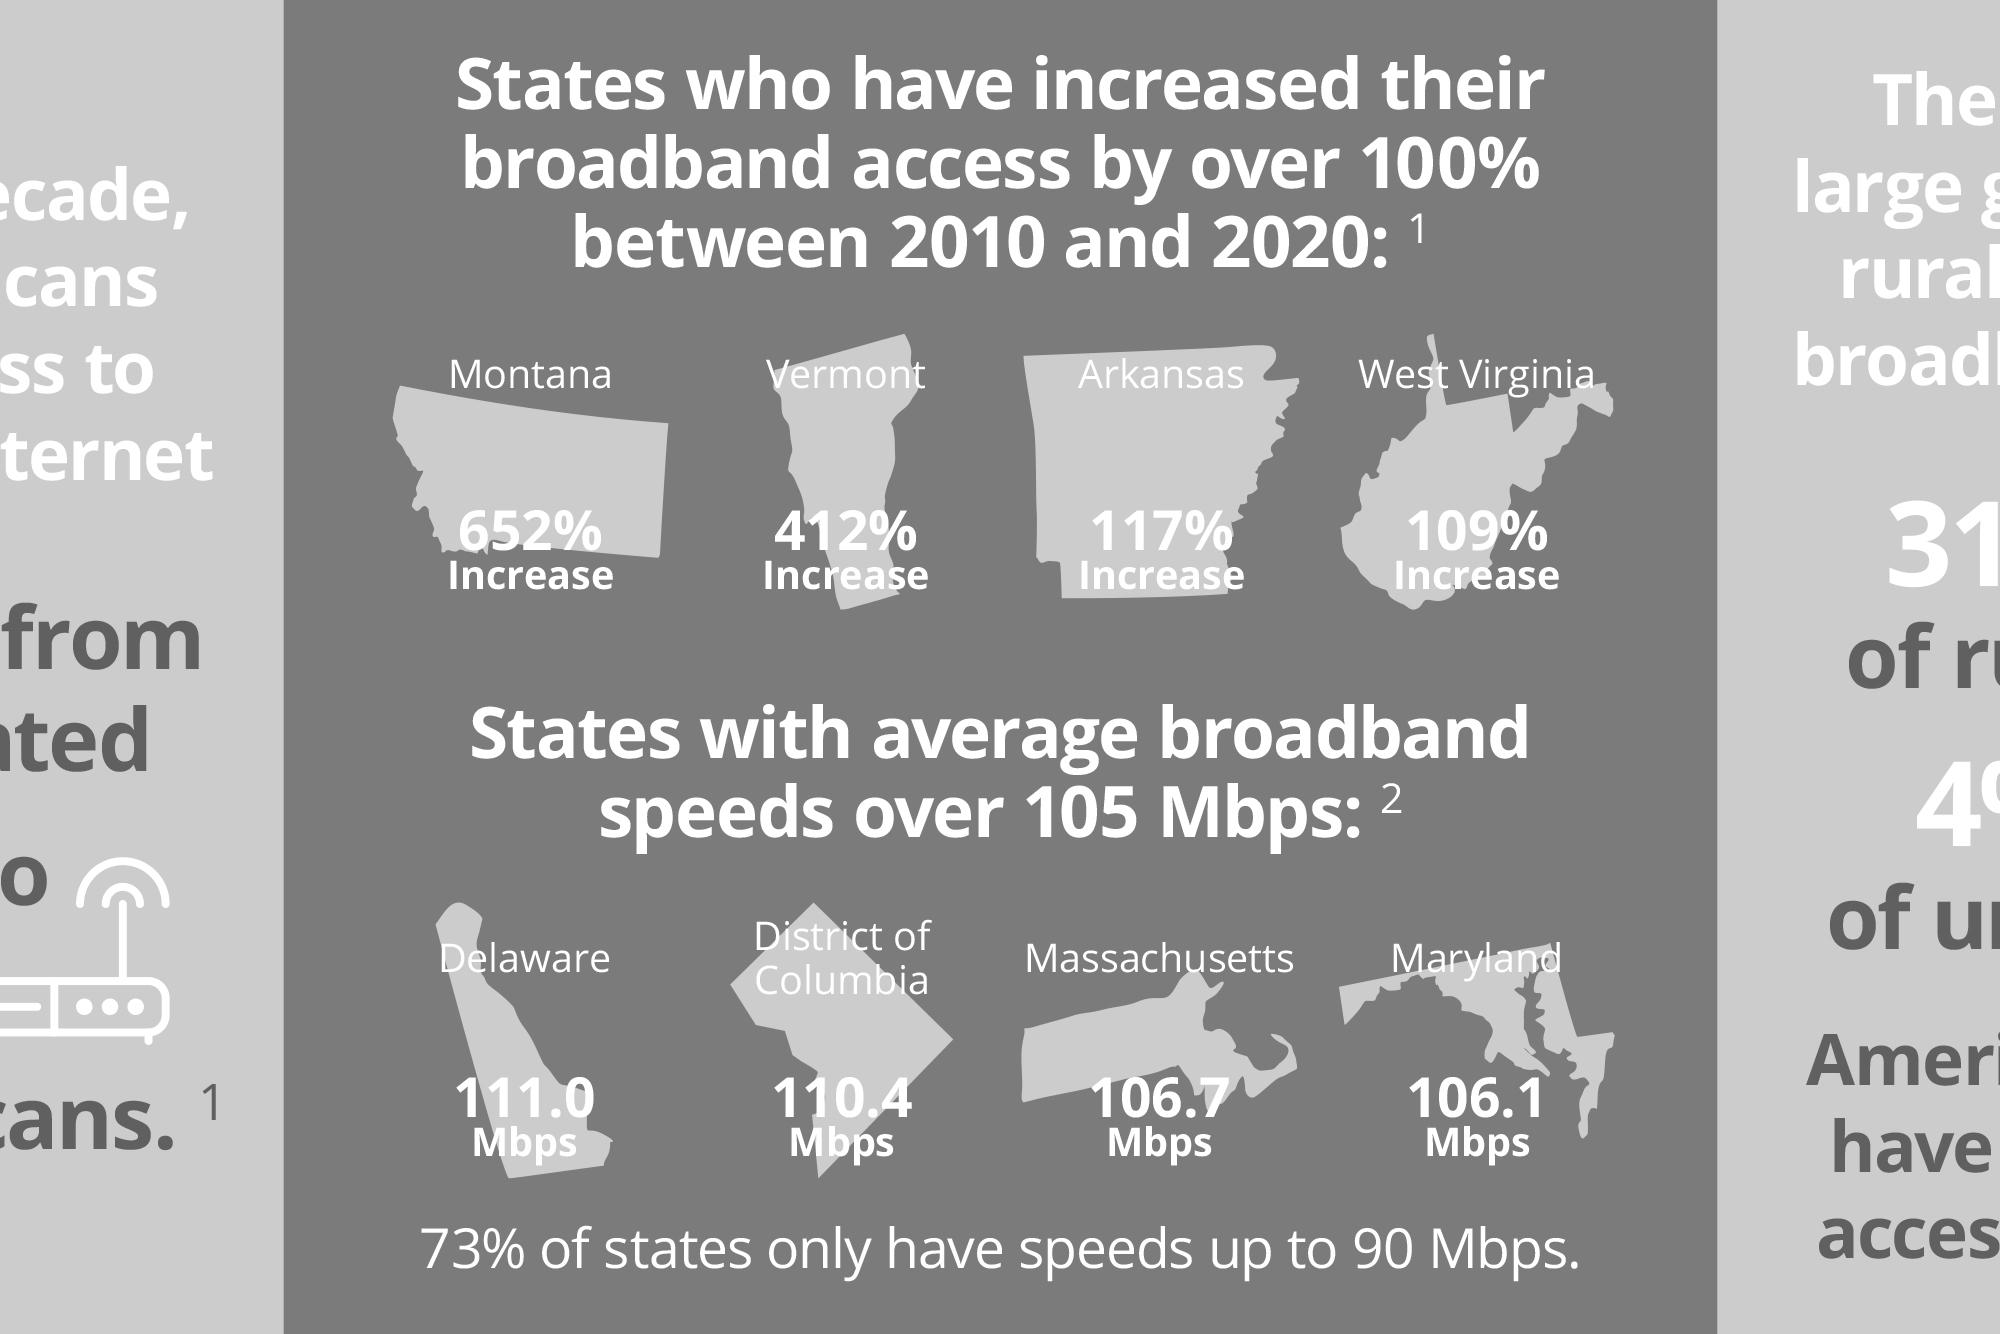 Increasing Broadband Access in Rural Communities